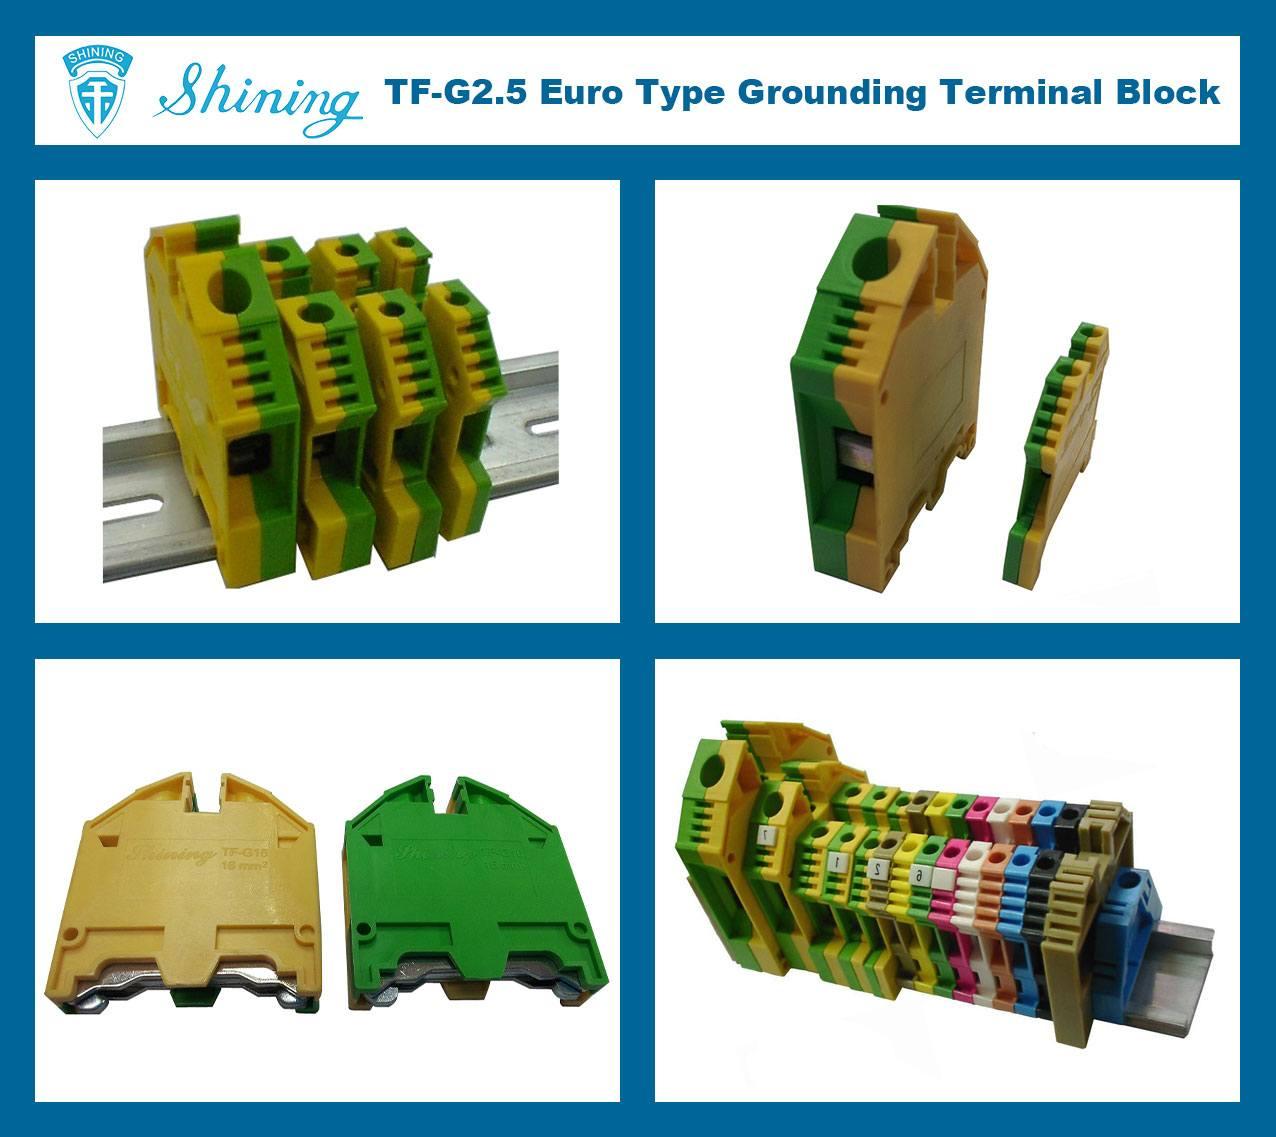 TF-G2.5 Euro Type 2.5mm Ground Earthing Terminal Strip